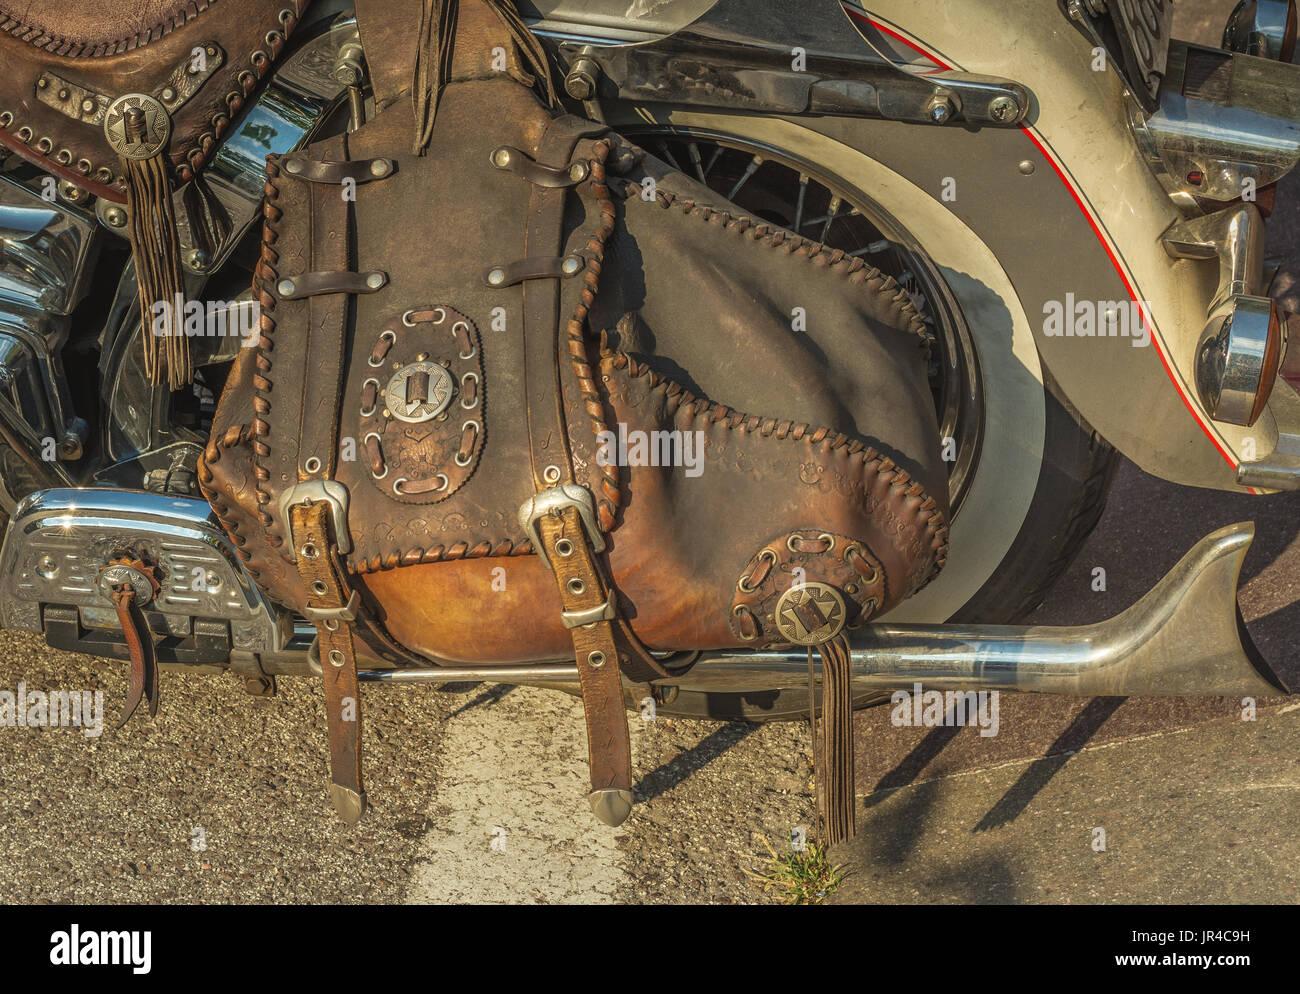 Saddle Bags Stock Photos & Saddle Bags Stock Images